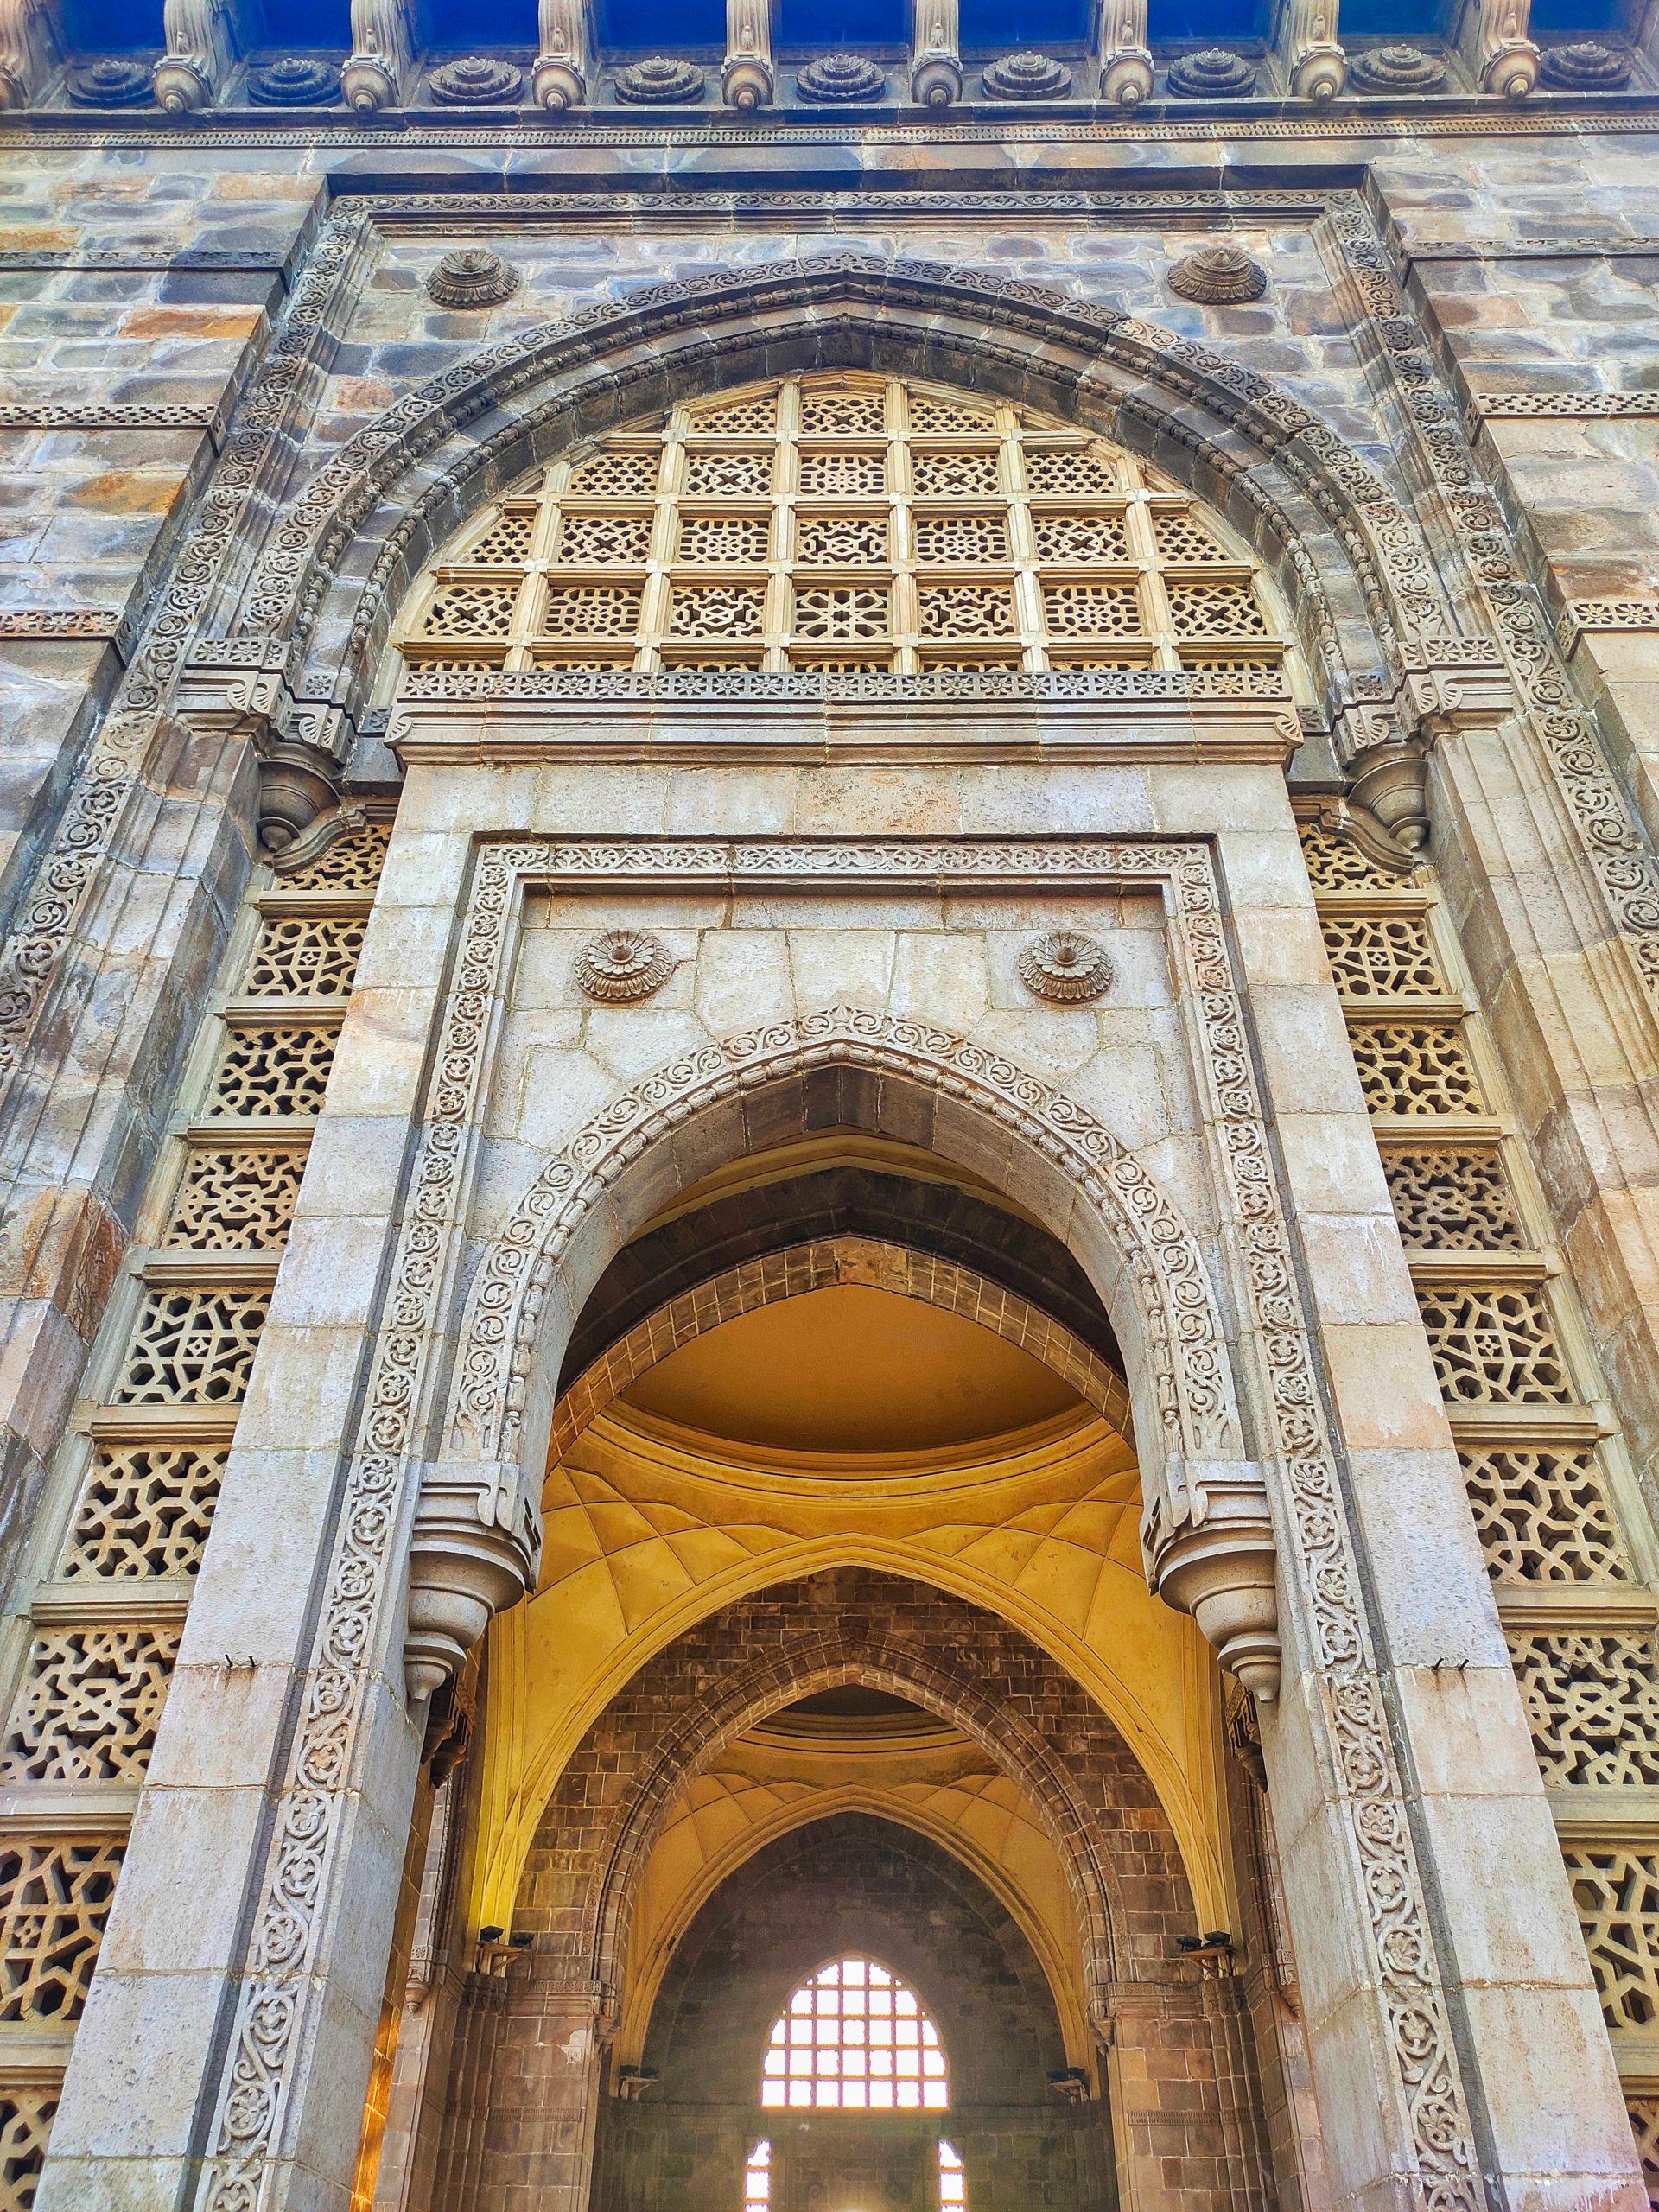 Close up of Gateway of India in Mumbai